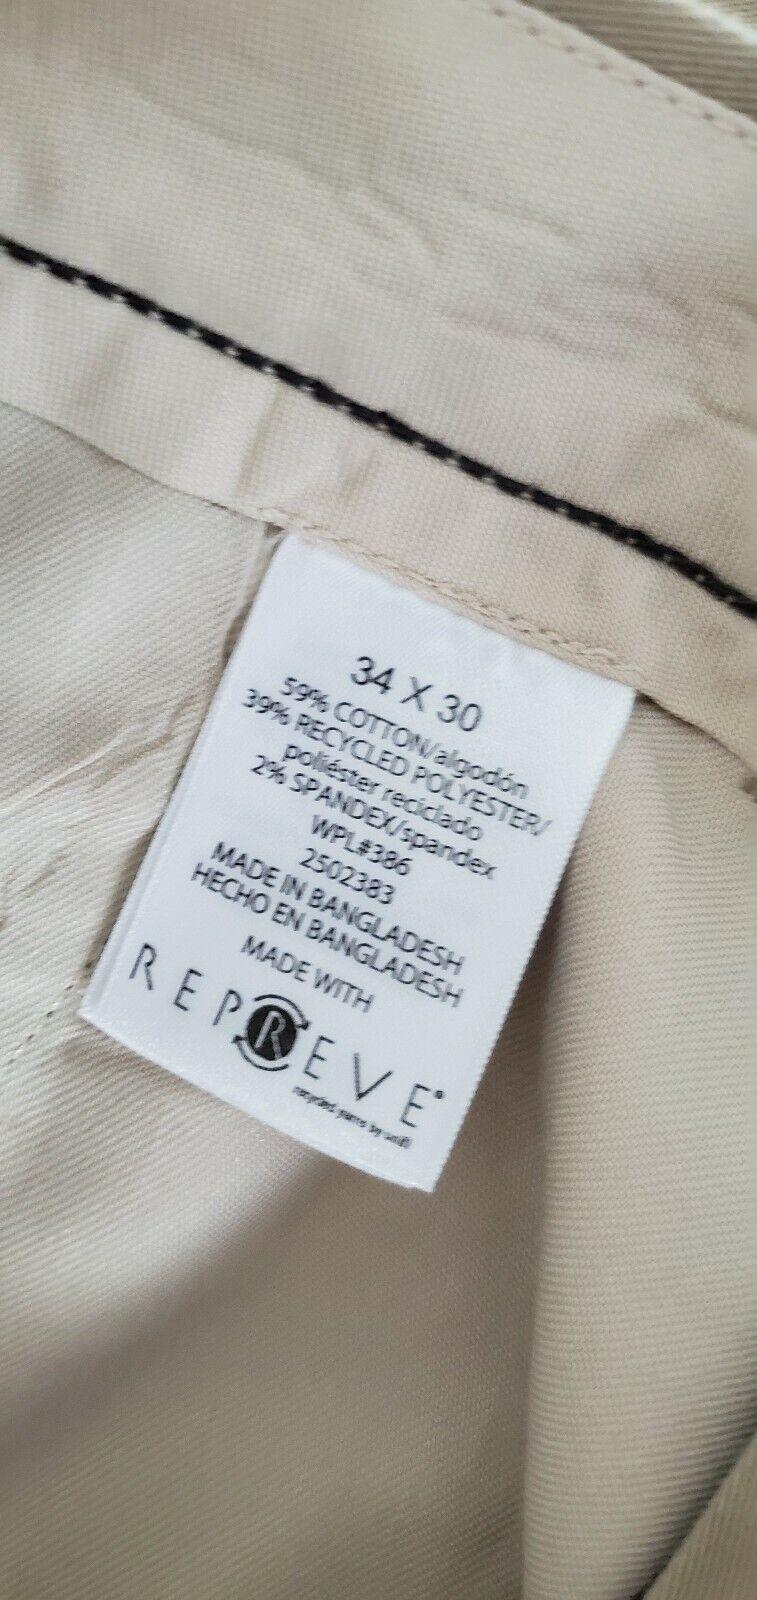 GAP Men/'s Brown Slim Fit Flat Front Pant Size 31,32,33,36,40 NWT